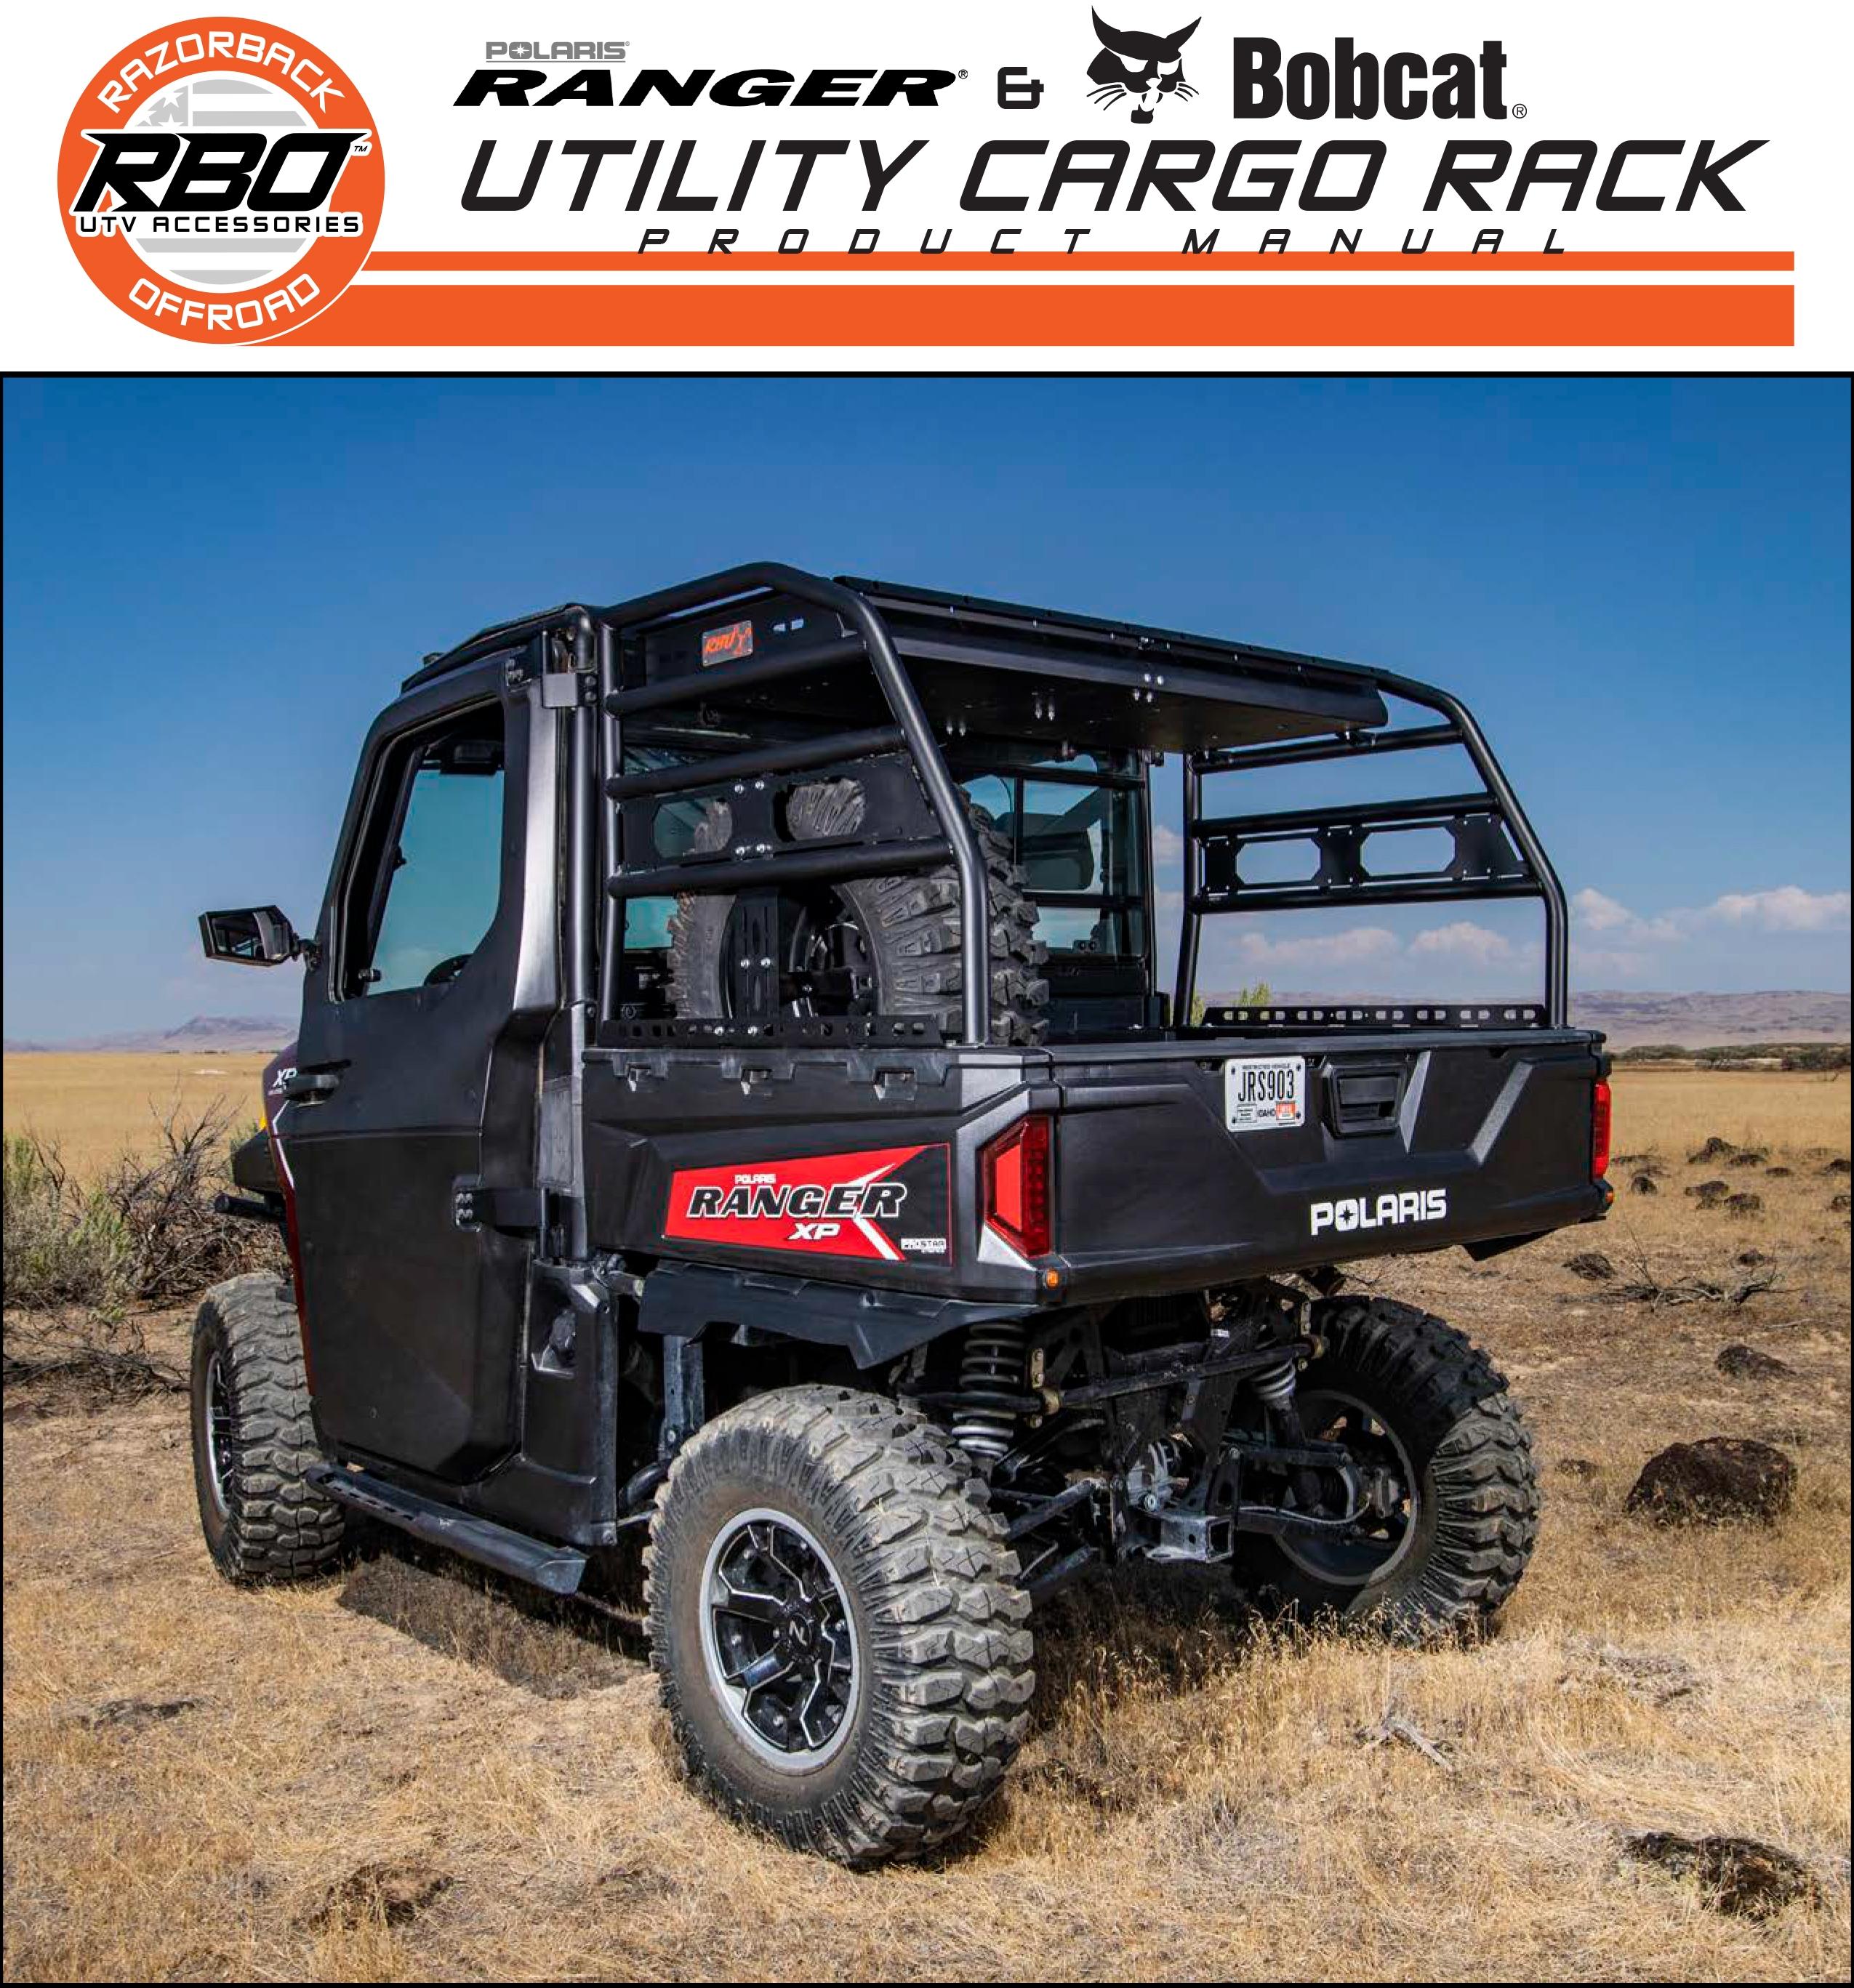 RBO Polaris Ranger and Bobcat Utility Cargo Rack Product Manual